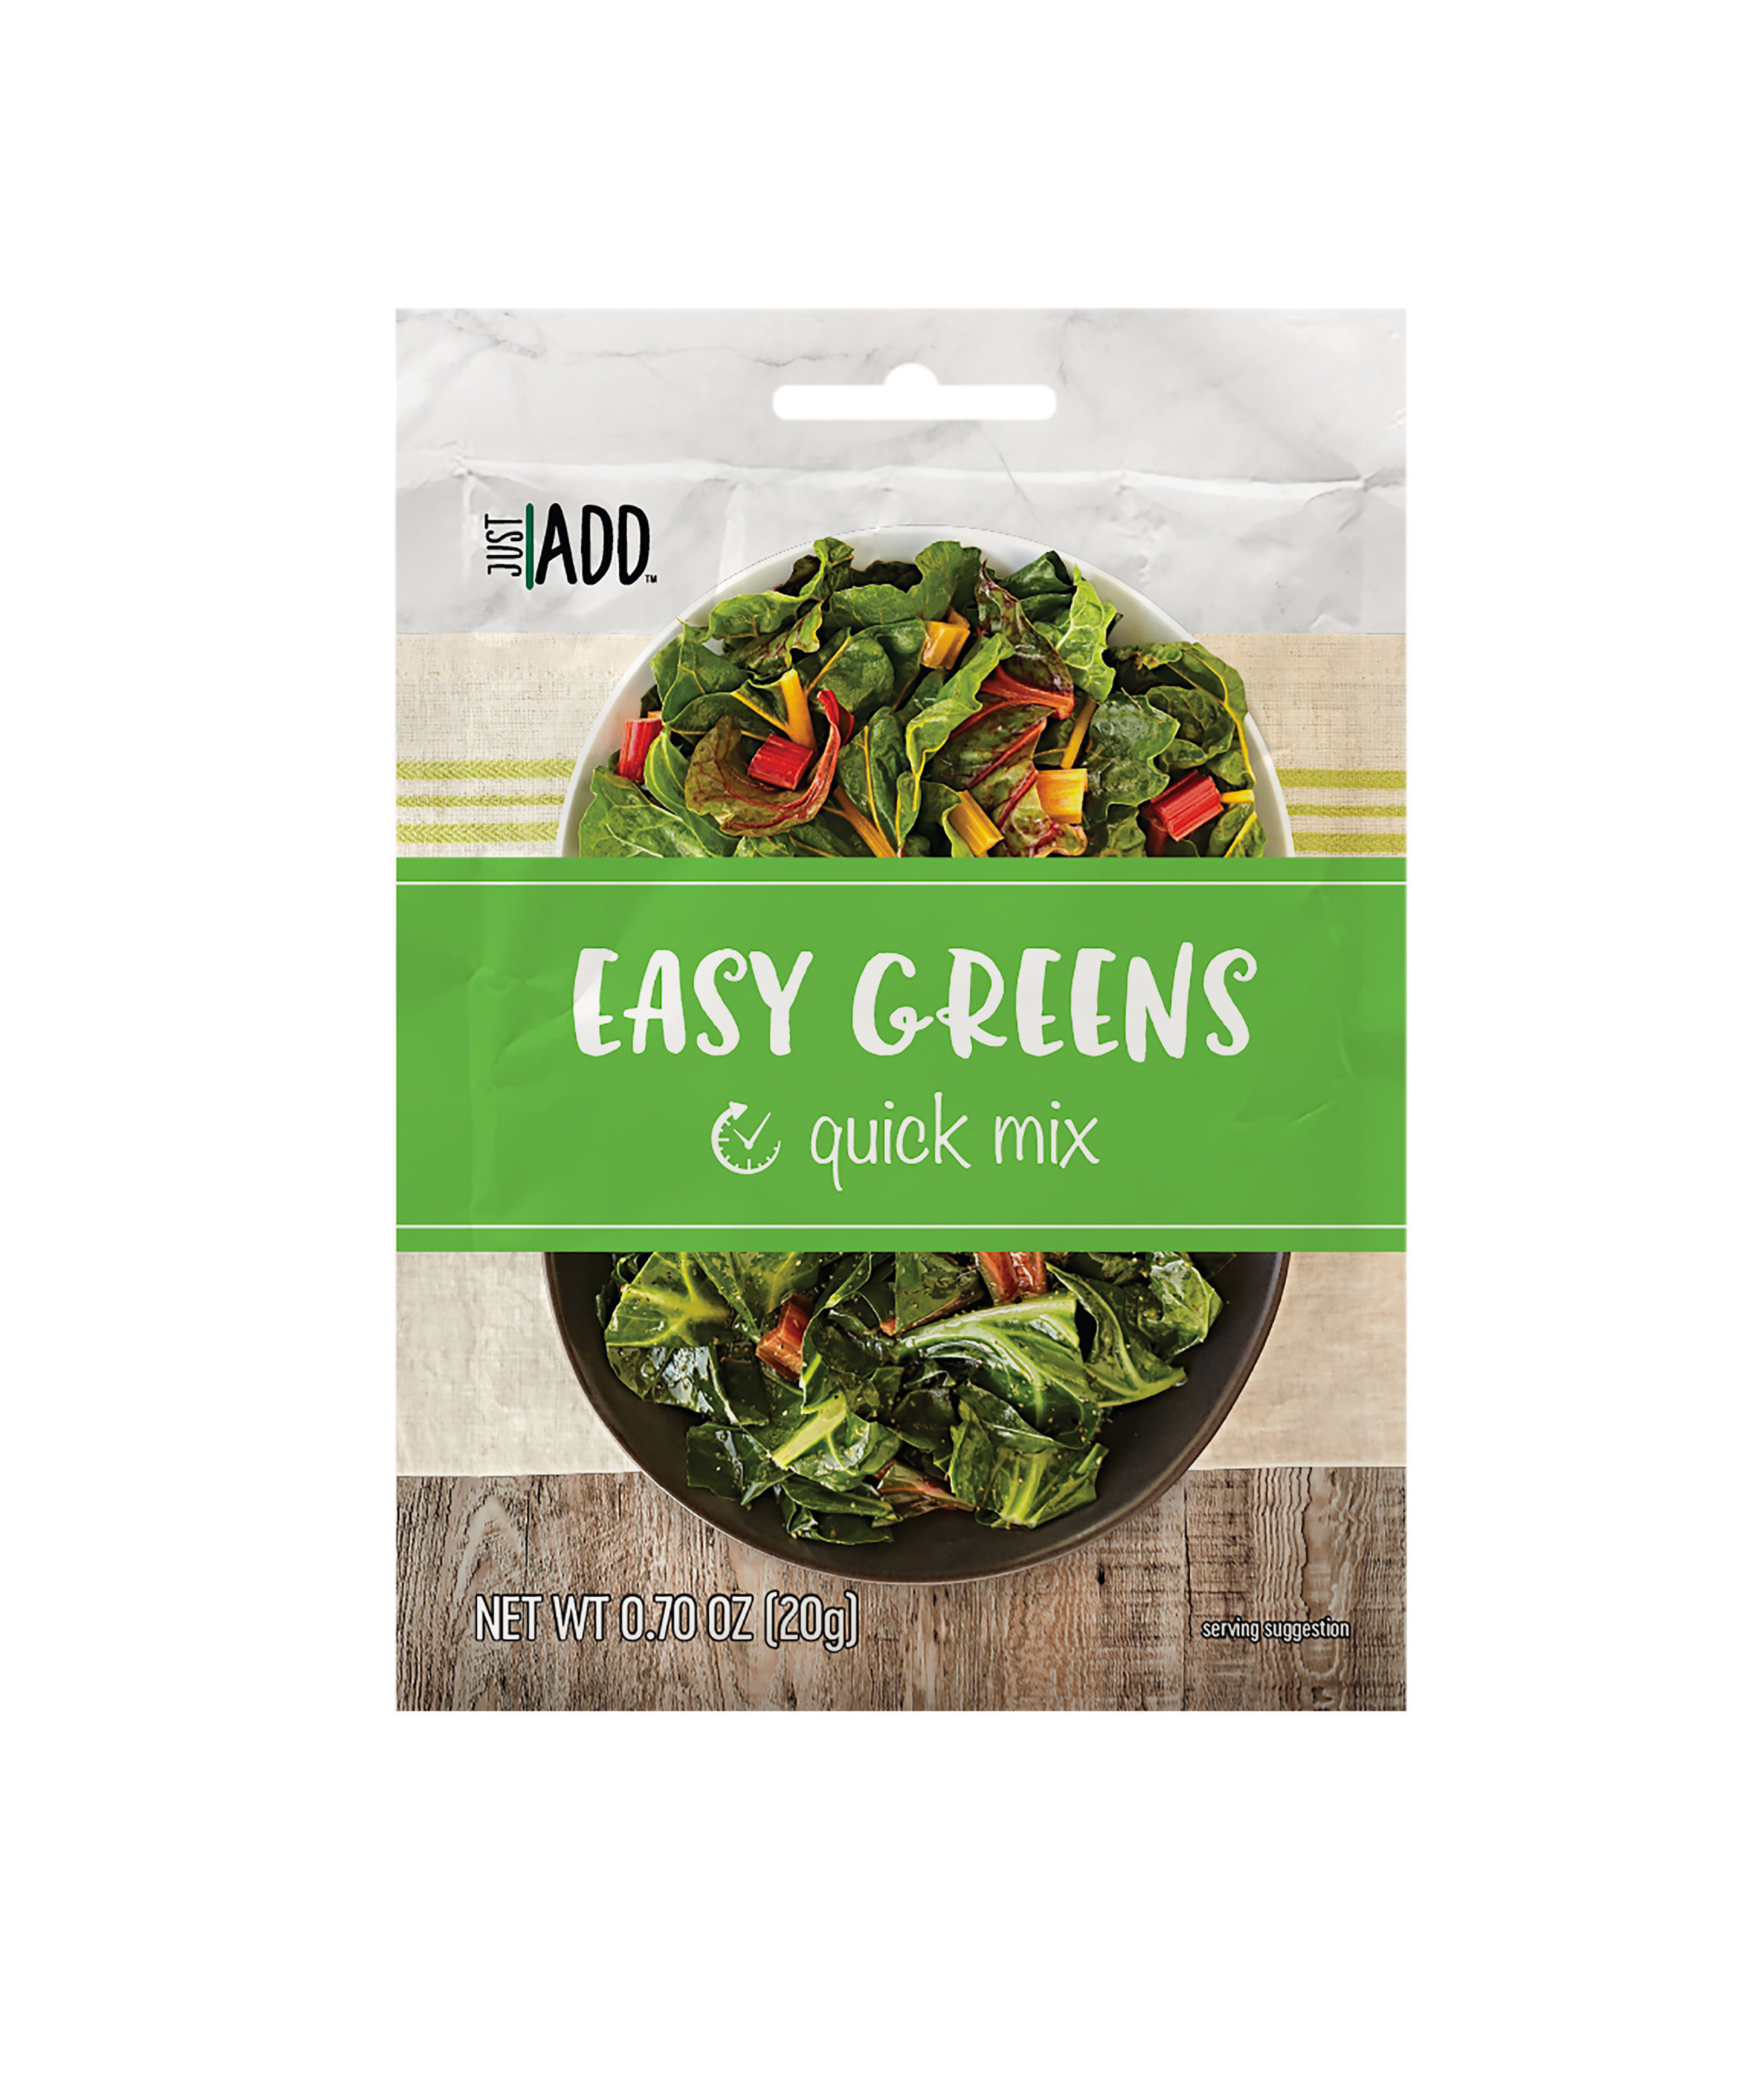 13340-Easy-Greens-FRONT.jpg